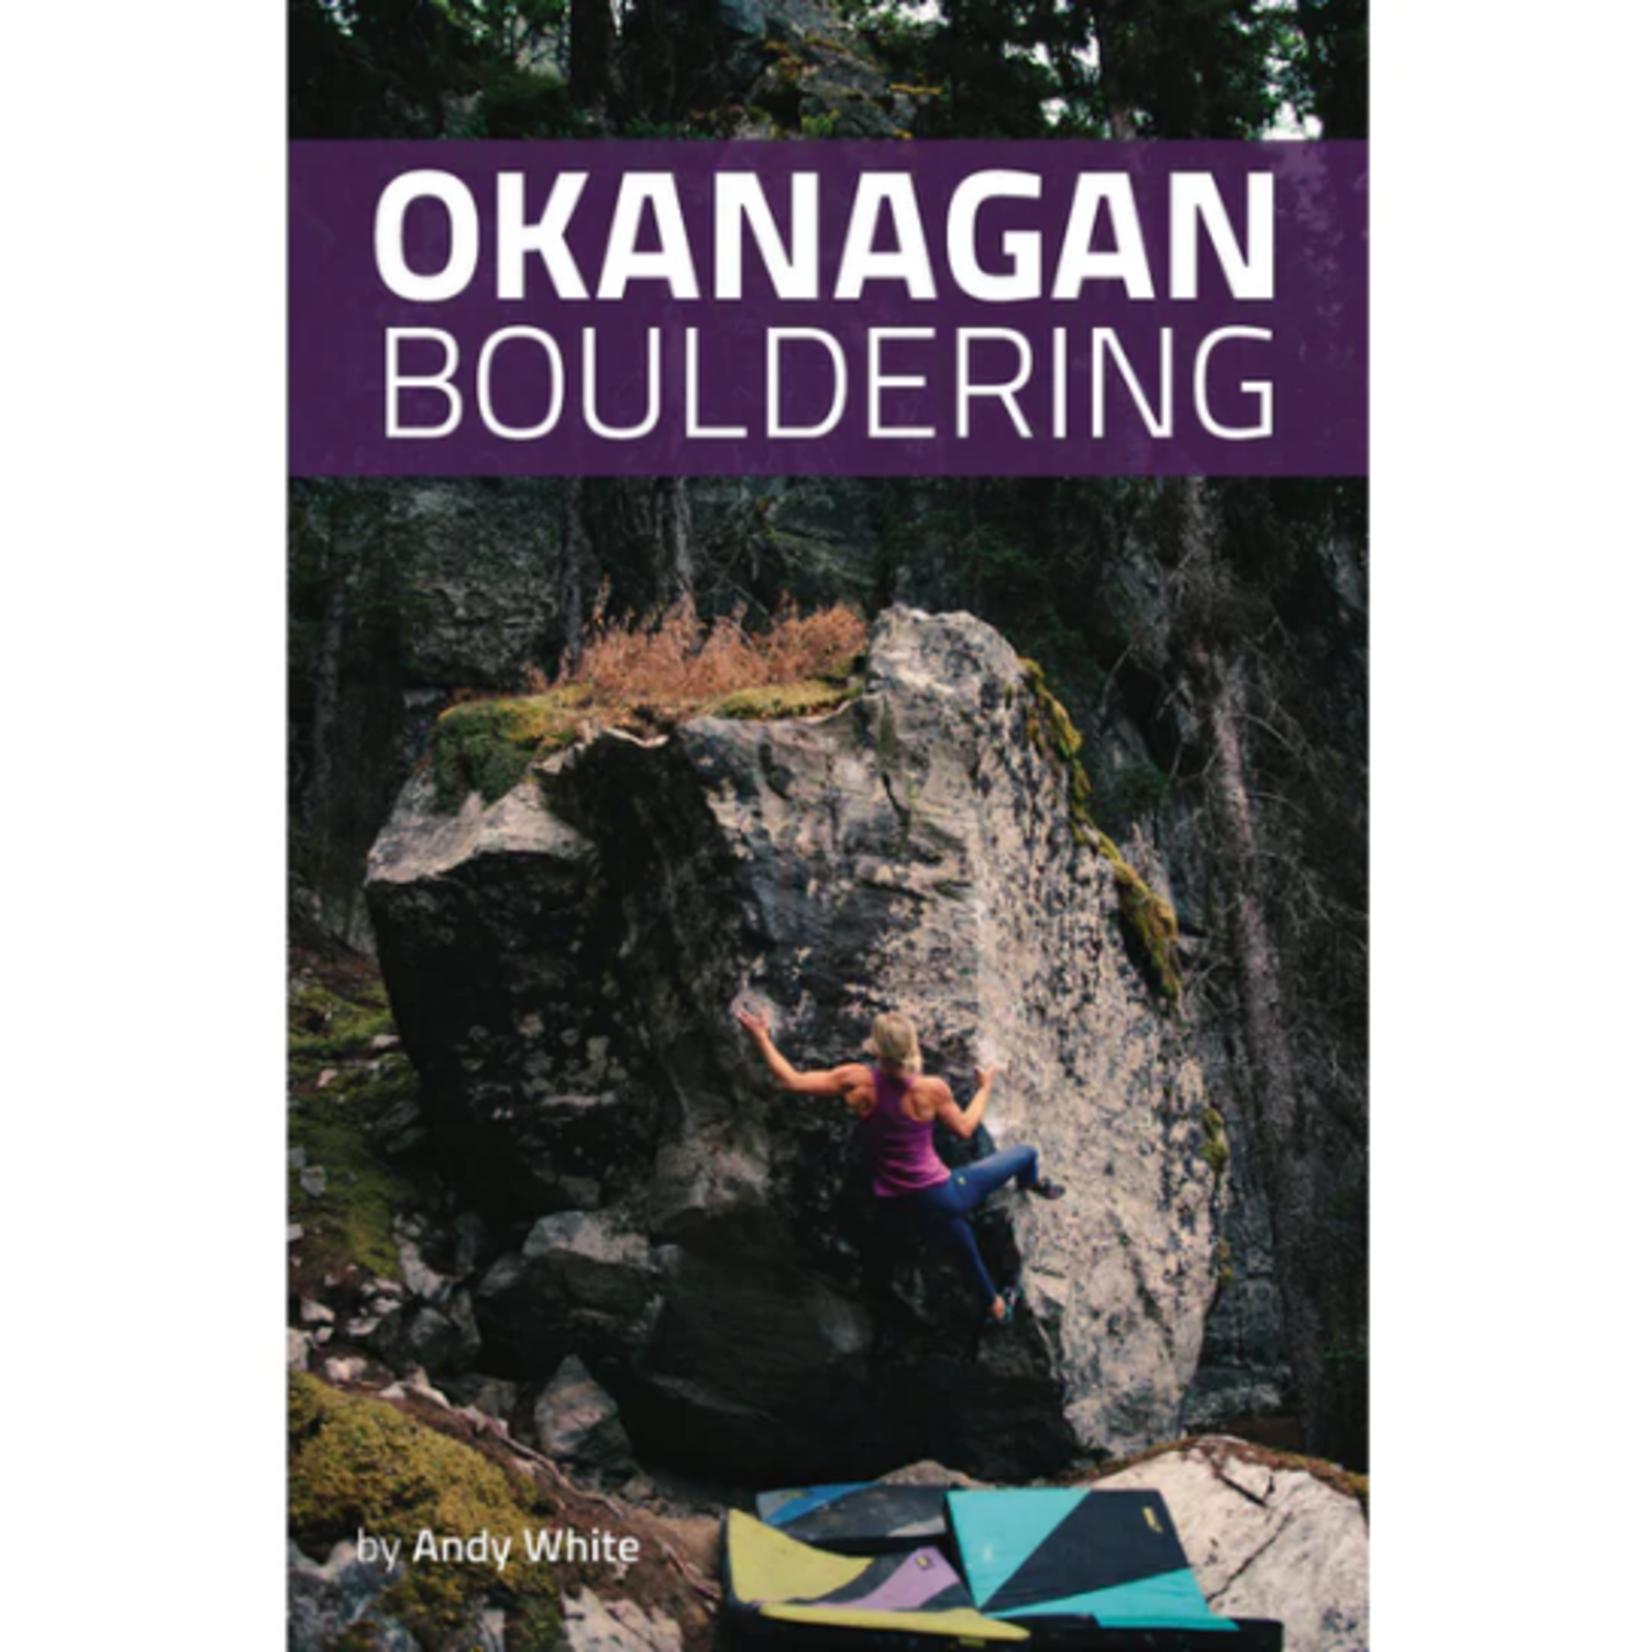 Okanagan Bouldering Guidebook